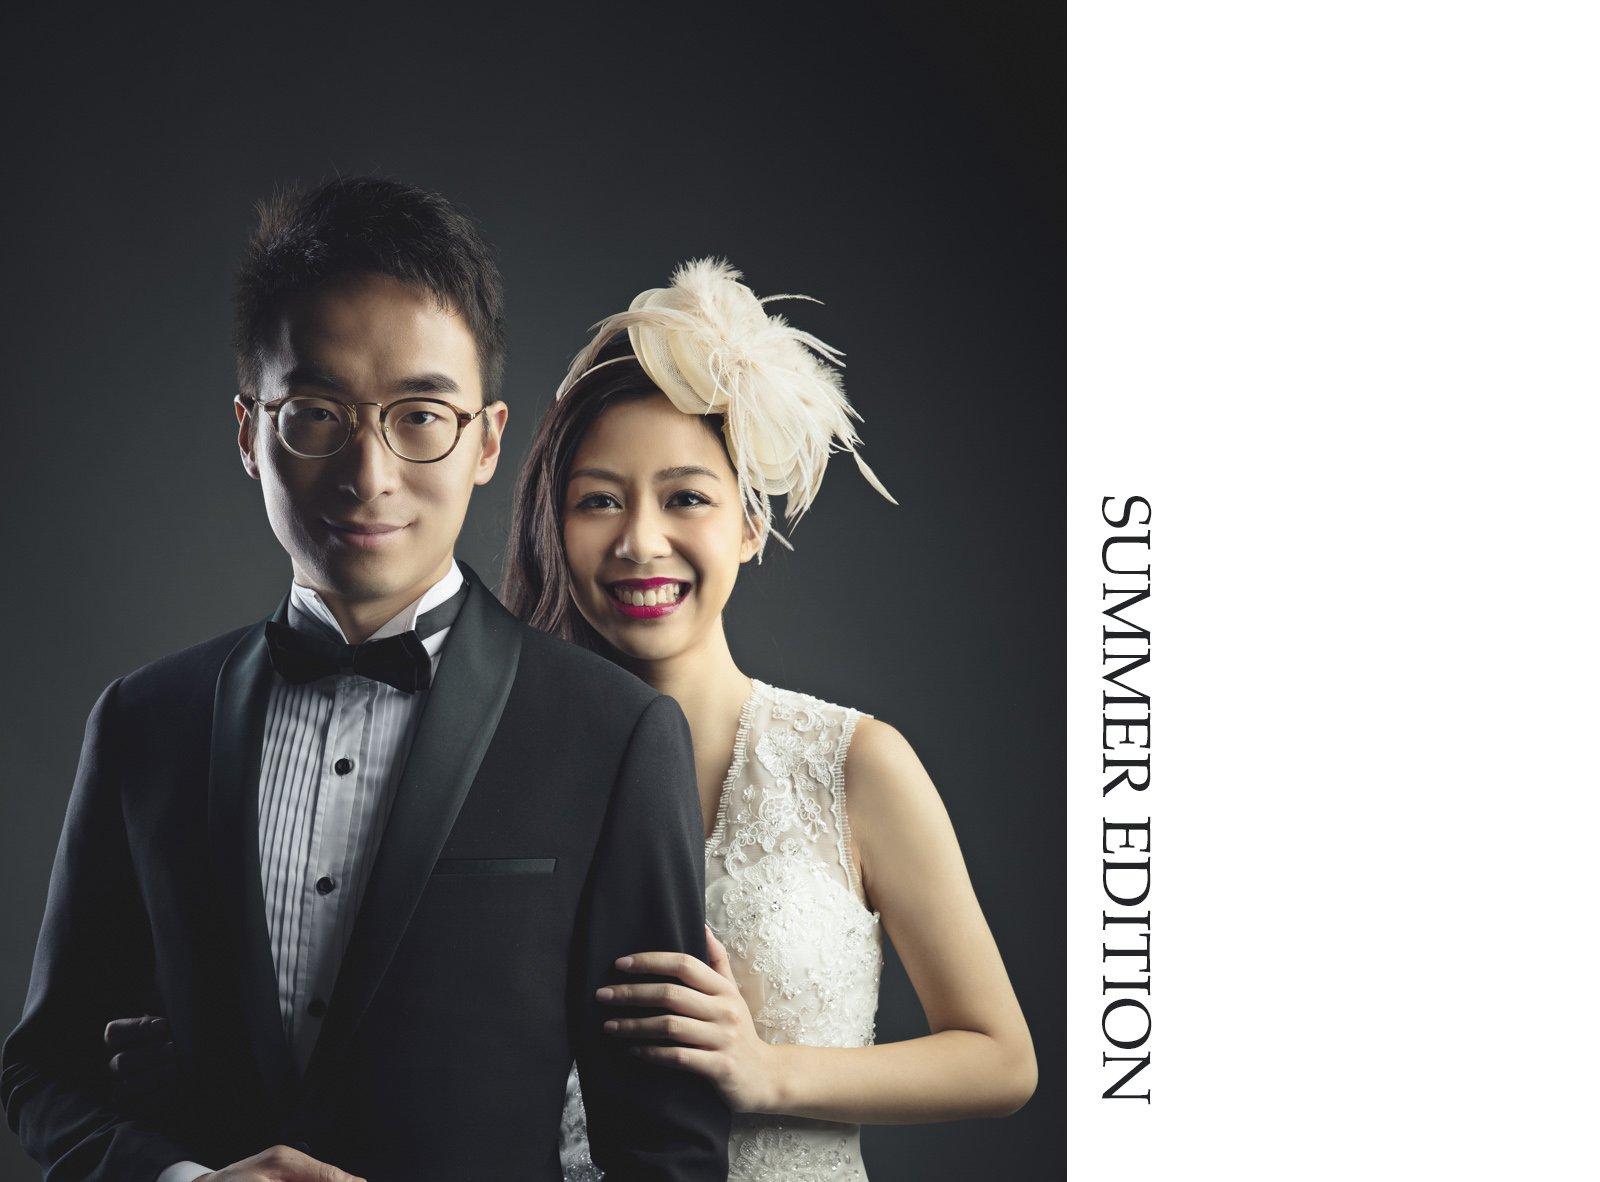 影樓拍攝套餐[夏日限定]   Studio Prewedding[summer limited]